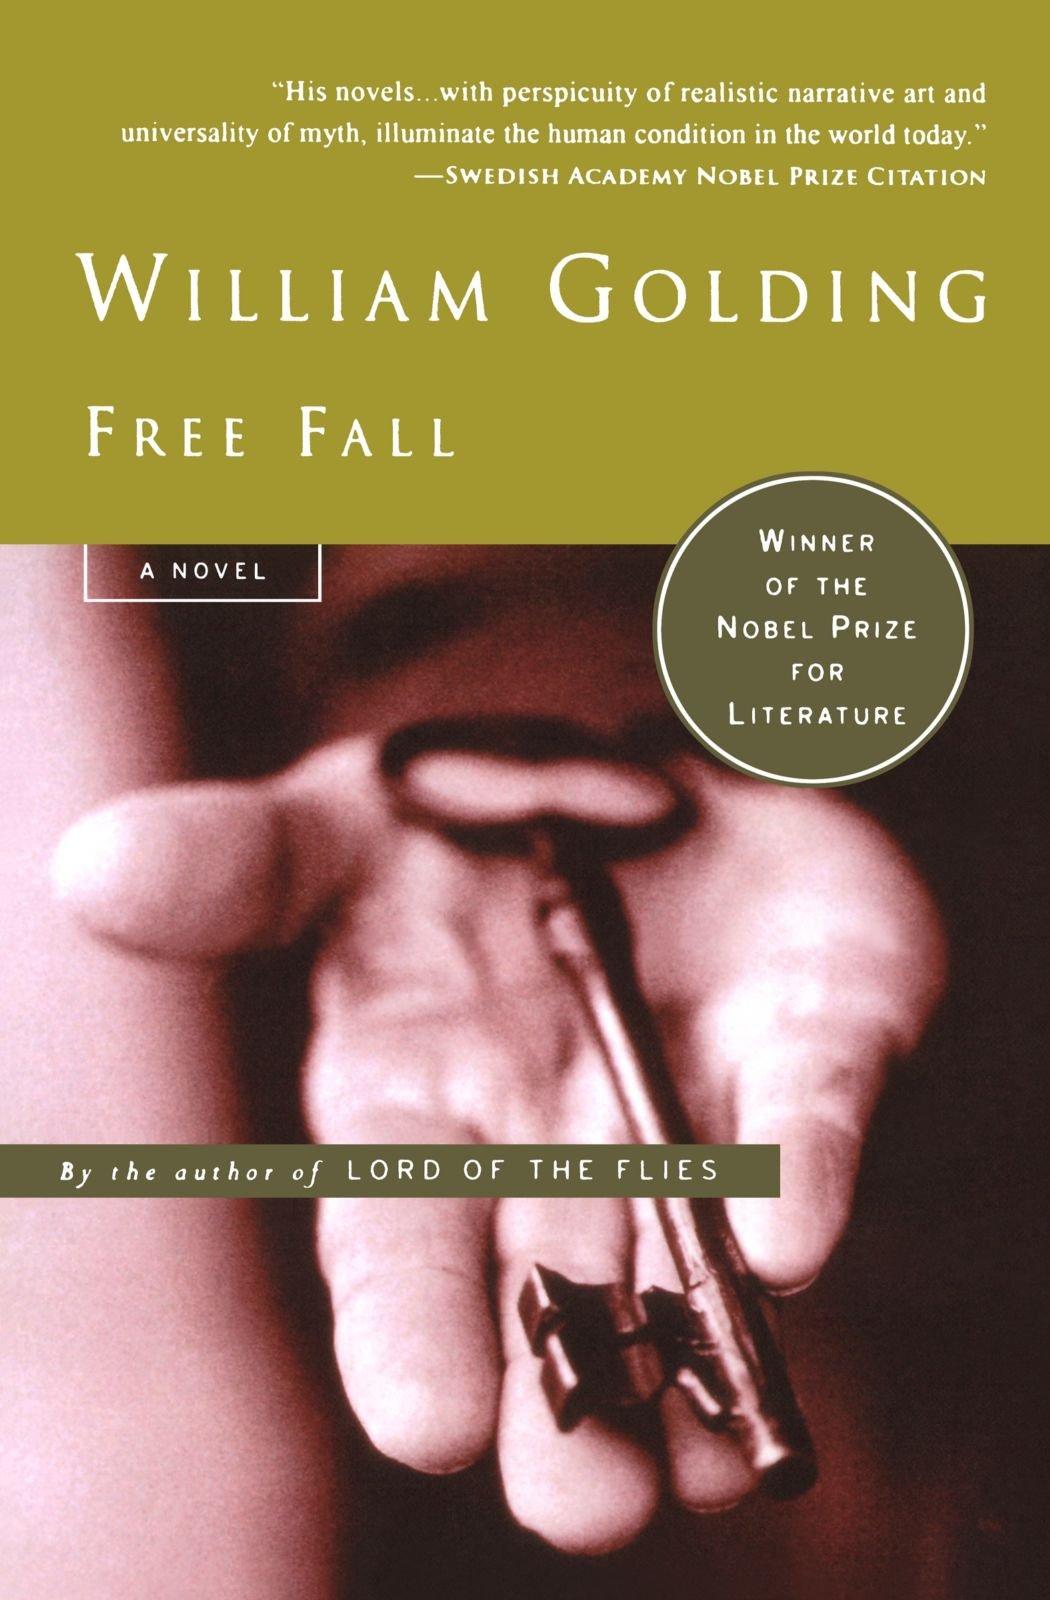 free fall william golding 9780156028233 amazon com books